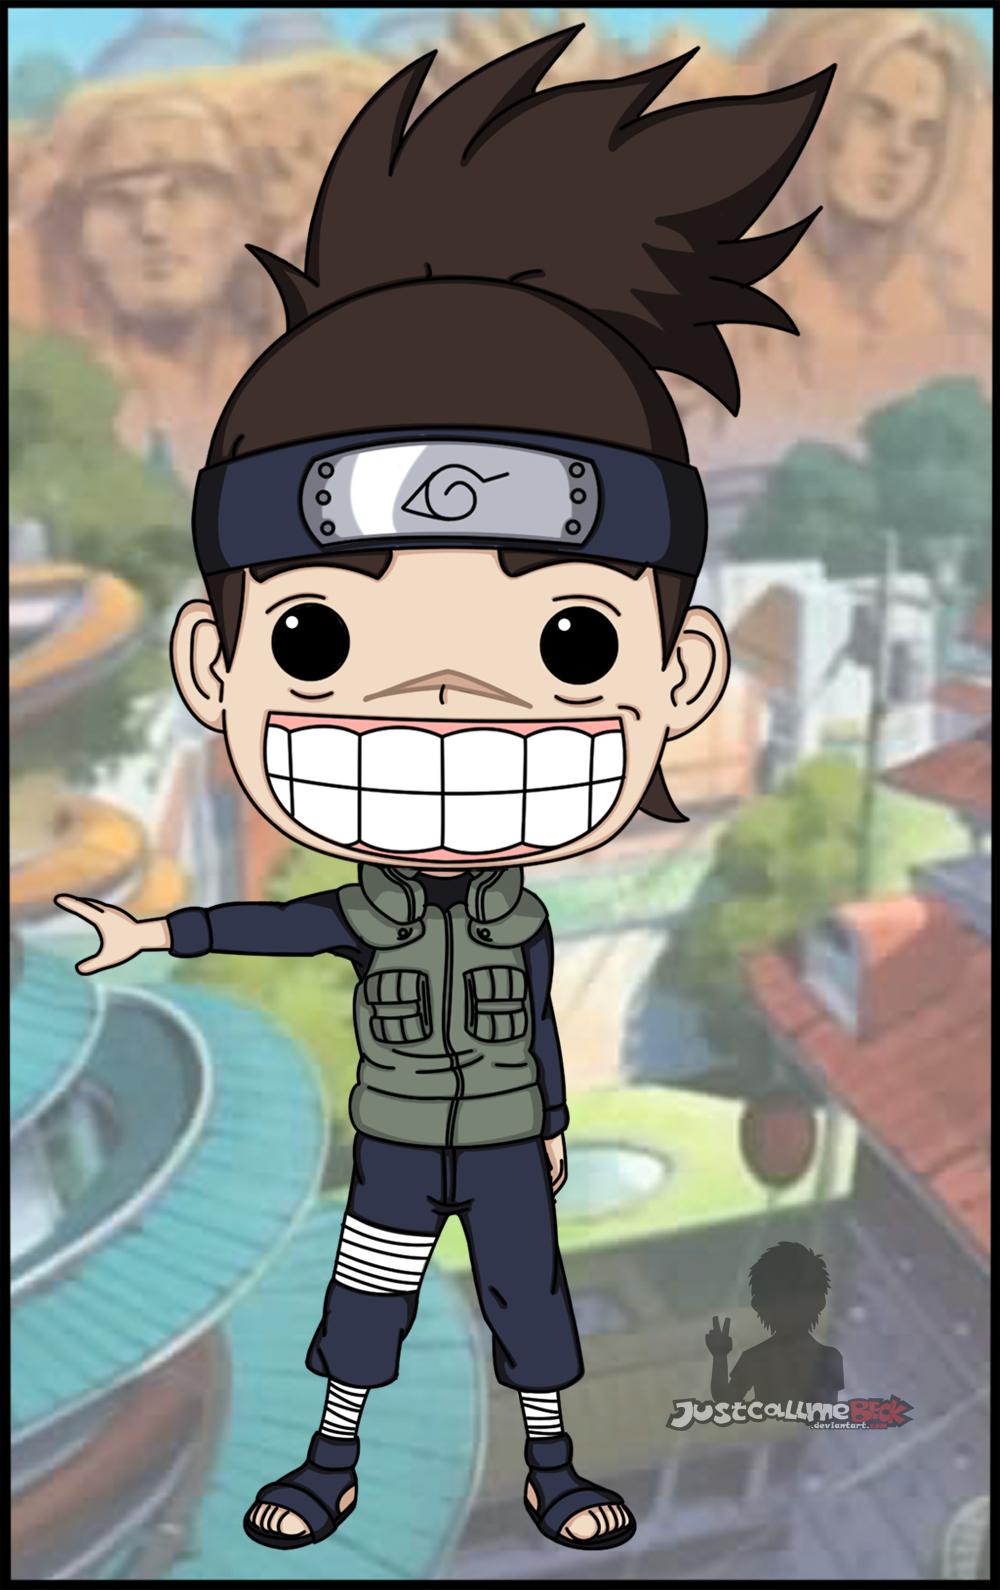 Naruto chibi fan art 21789436 fanpop - Naruto chibi images ...